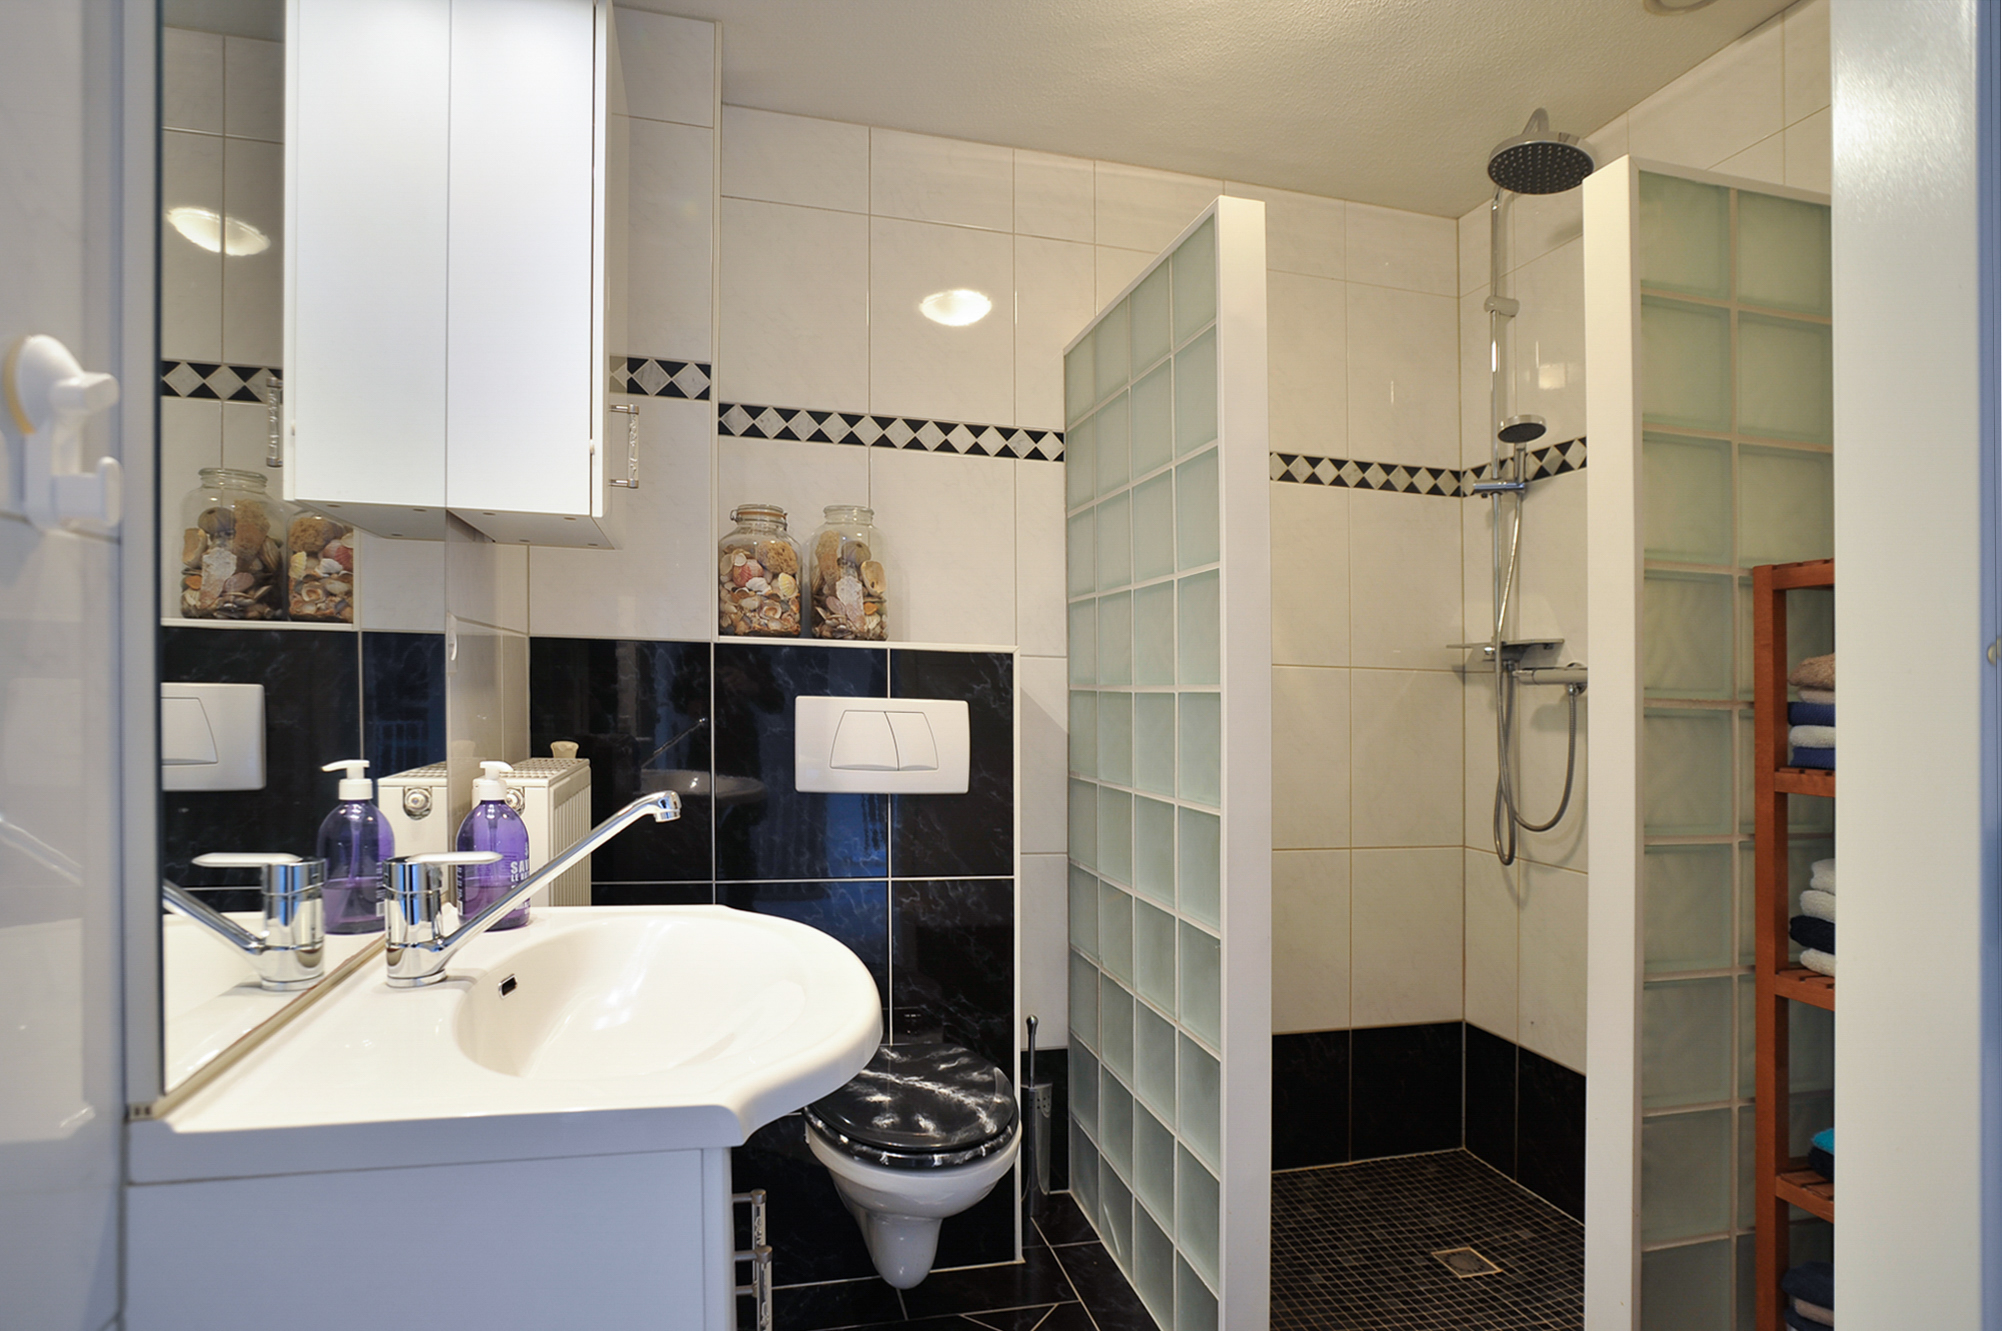 Witte Keuken In Prachtige Ruime Opstelling : Op de eerste verdieping ...